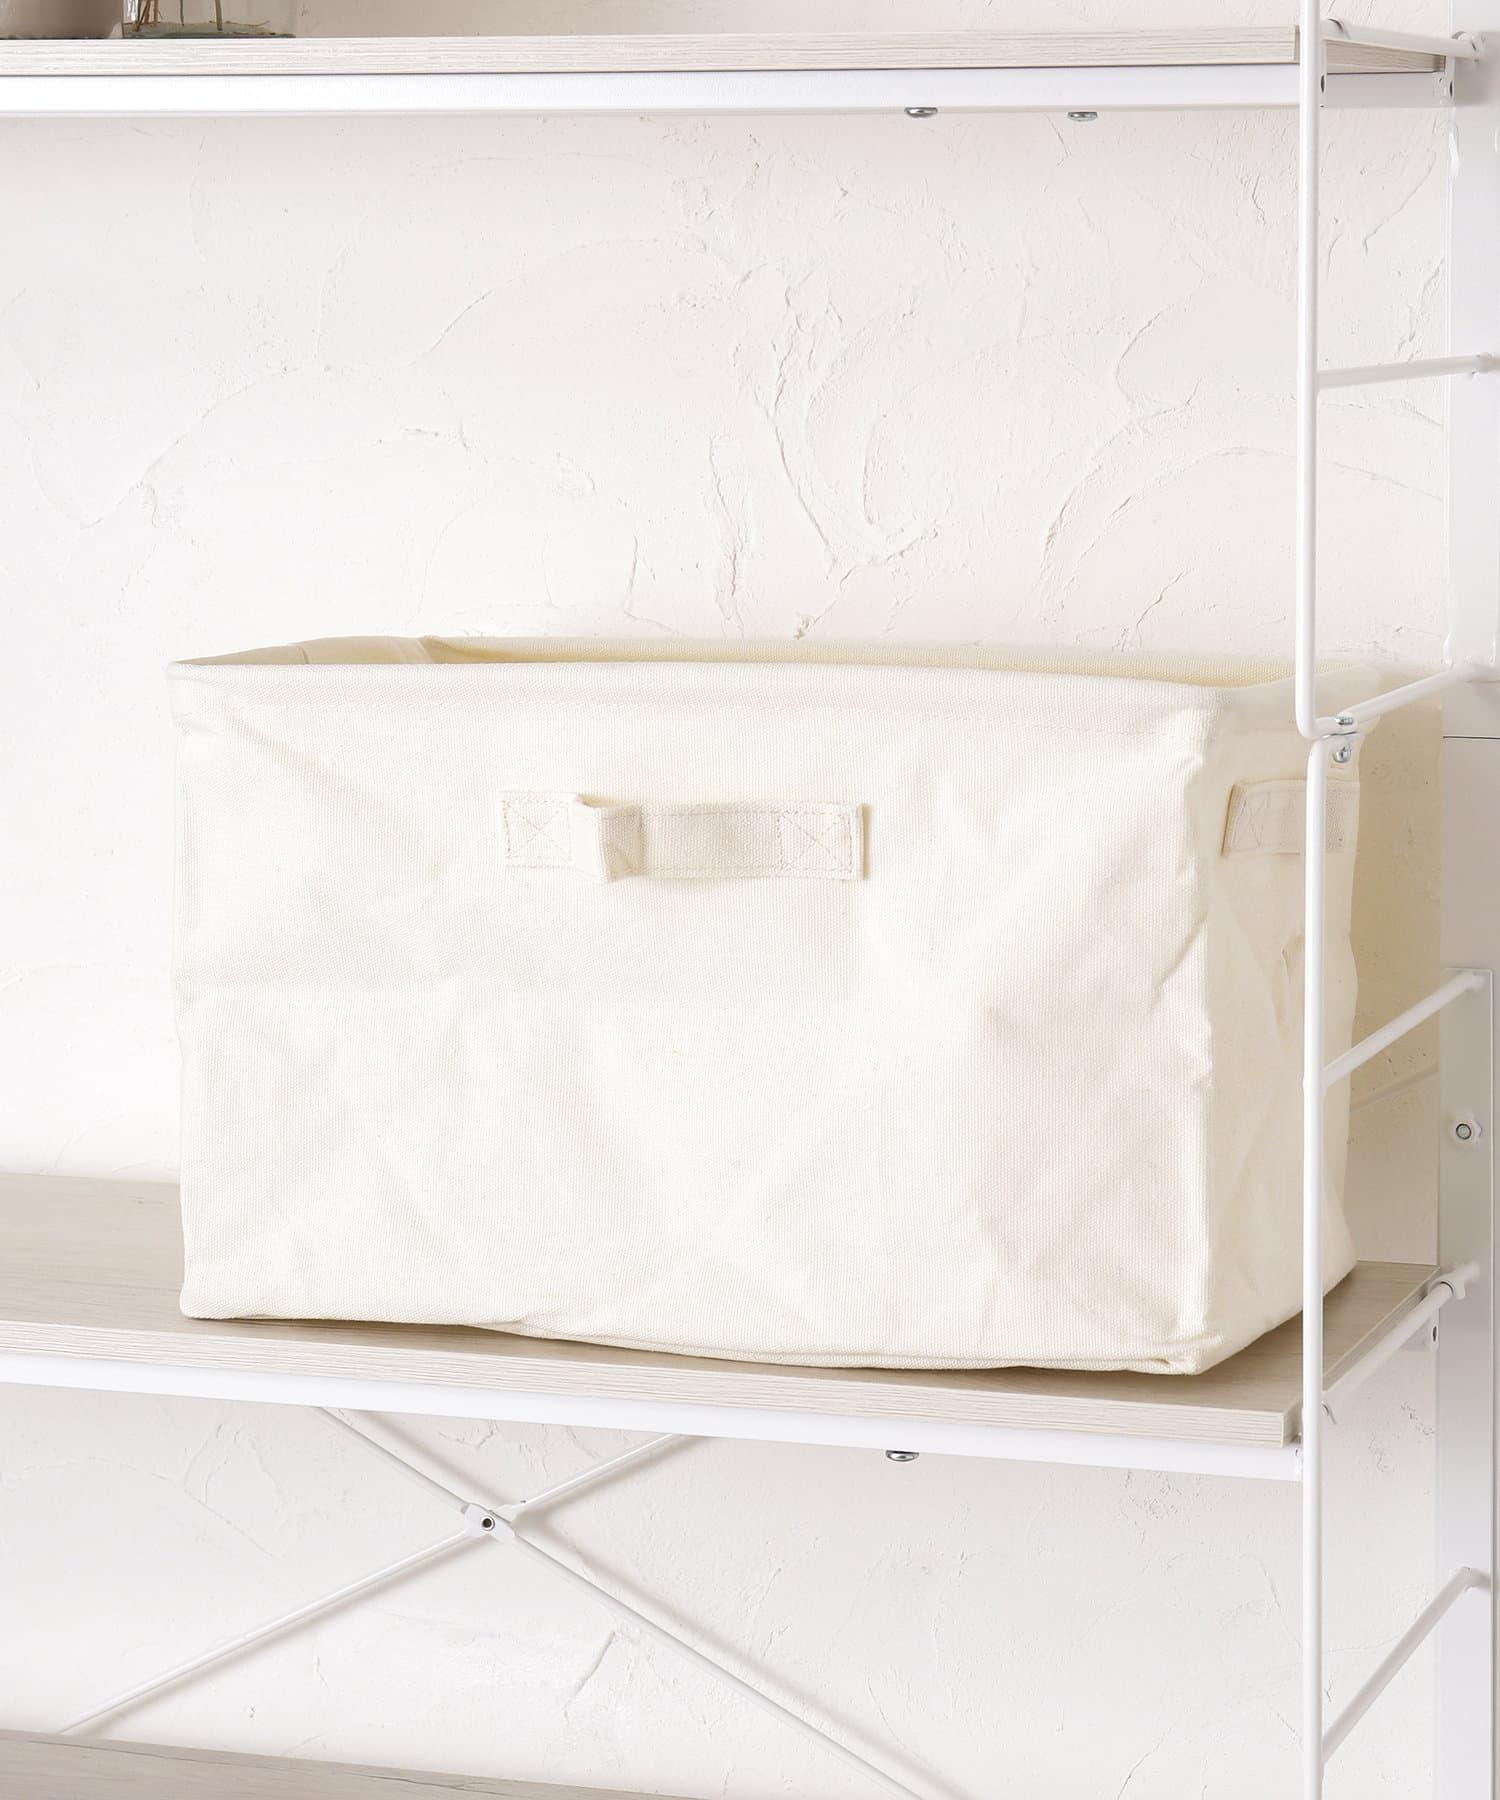 3COINS(スリーコインズ) ライフスタイル コットンワイド収納ボックス アイボリー